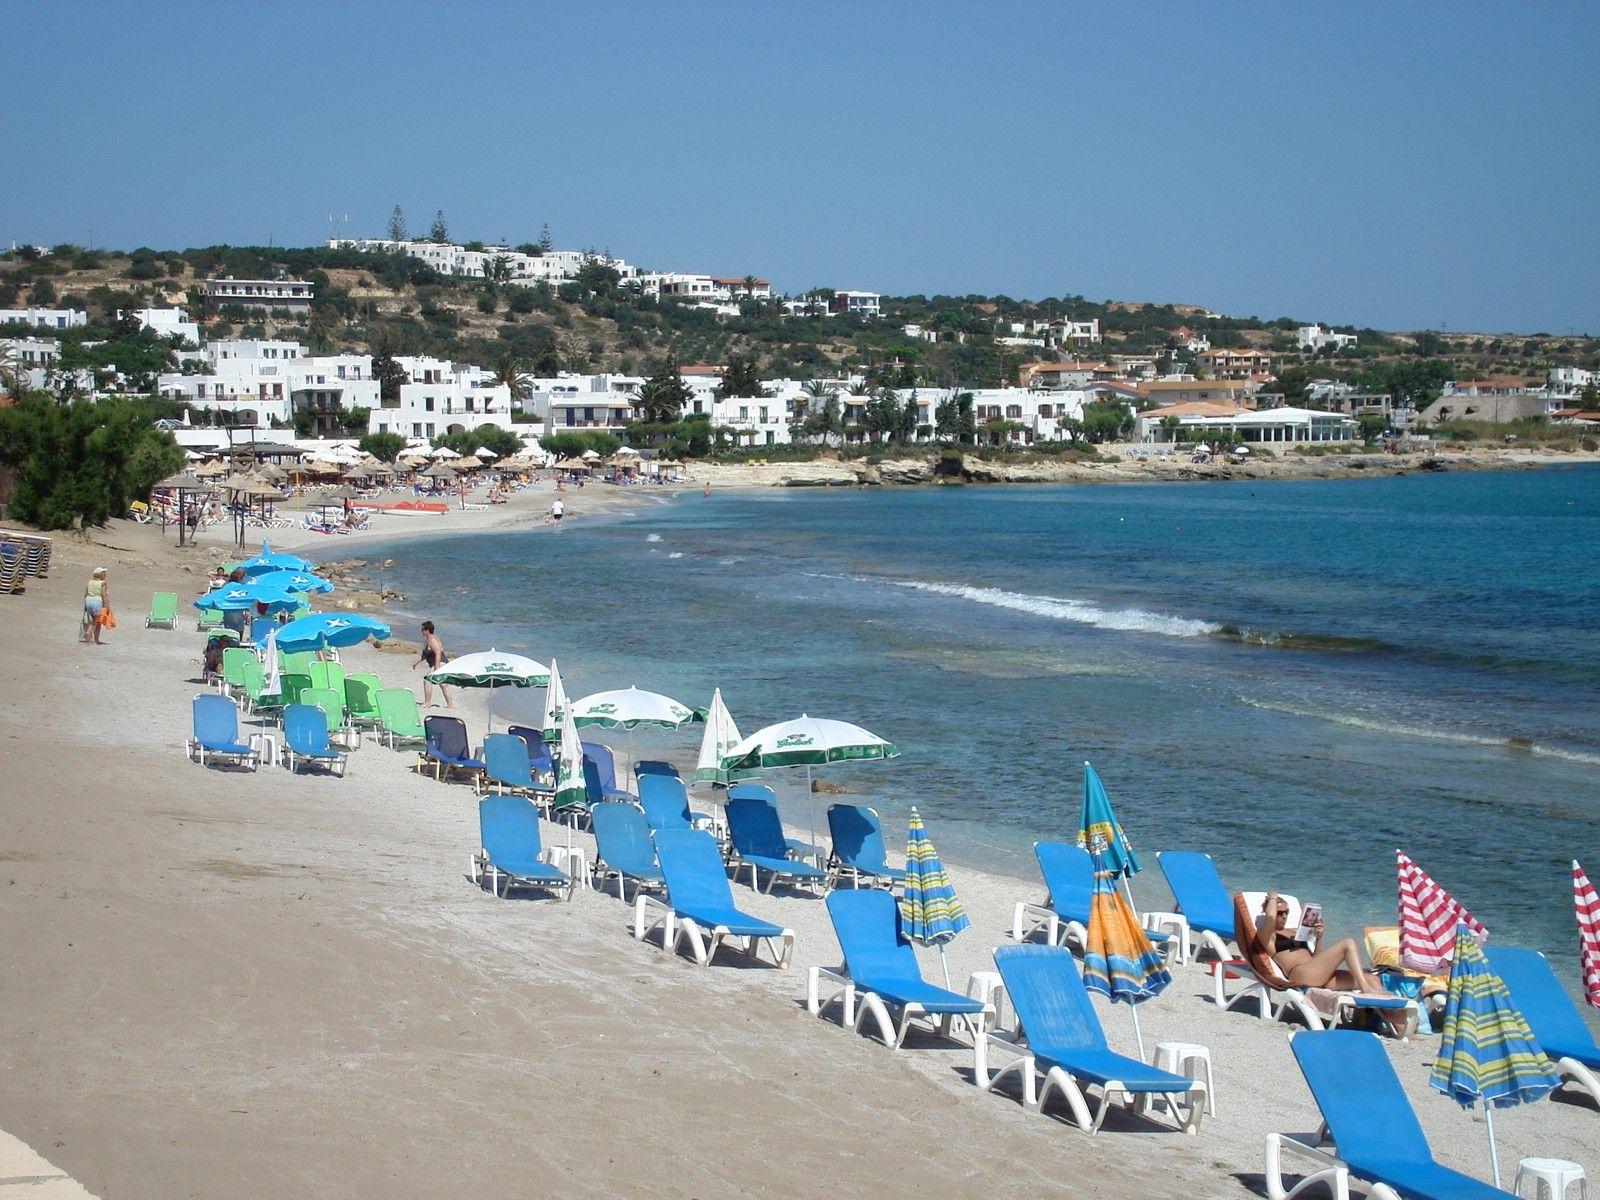 Plaja din Hersonissos, Creta